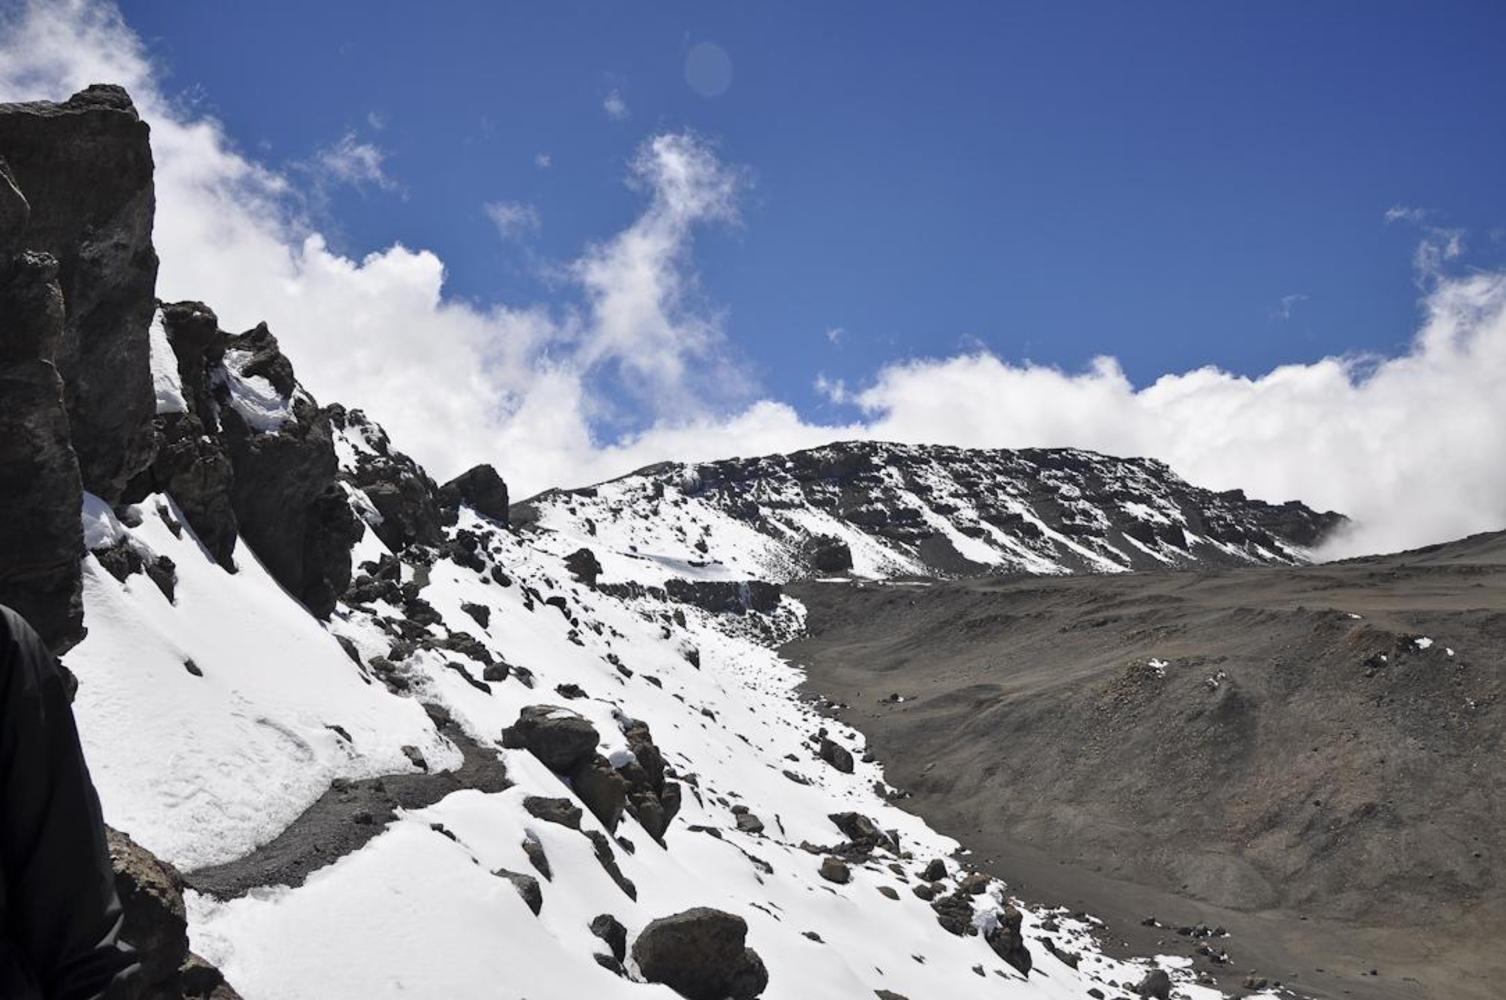 2010-02-02 - Voyage Kili - jour 11 -56